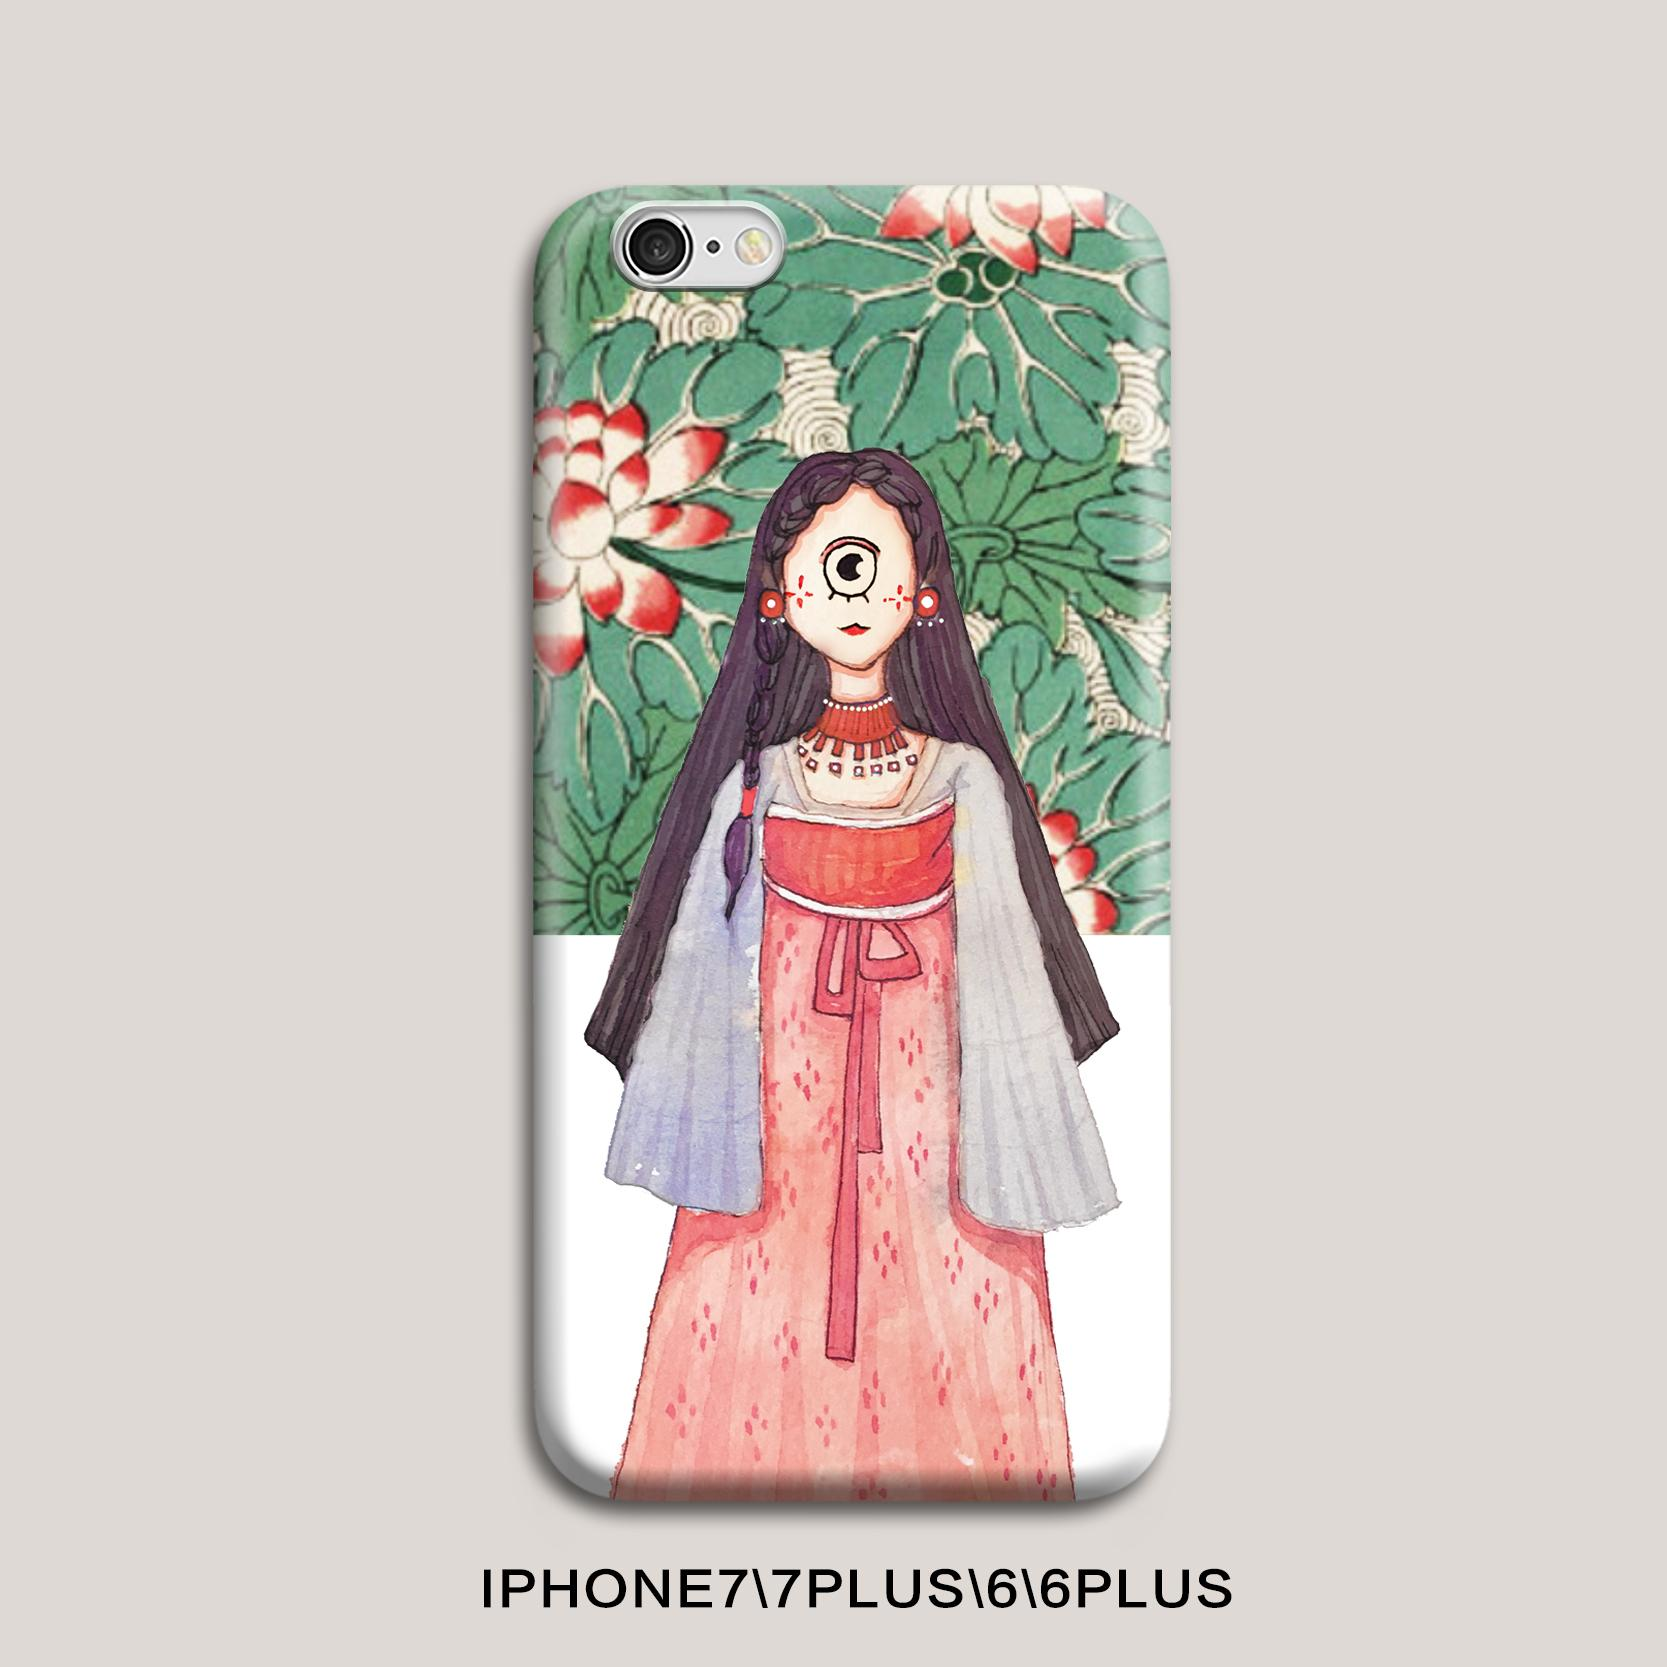 Padang Gurun Selubung Ponsel Hardcase IPhone7Plus Asli Teratai Bermata Satu Anak Perempuan